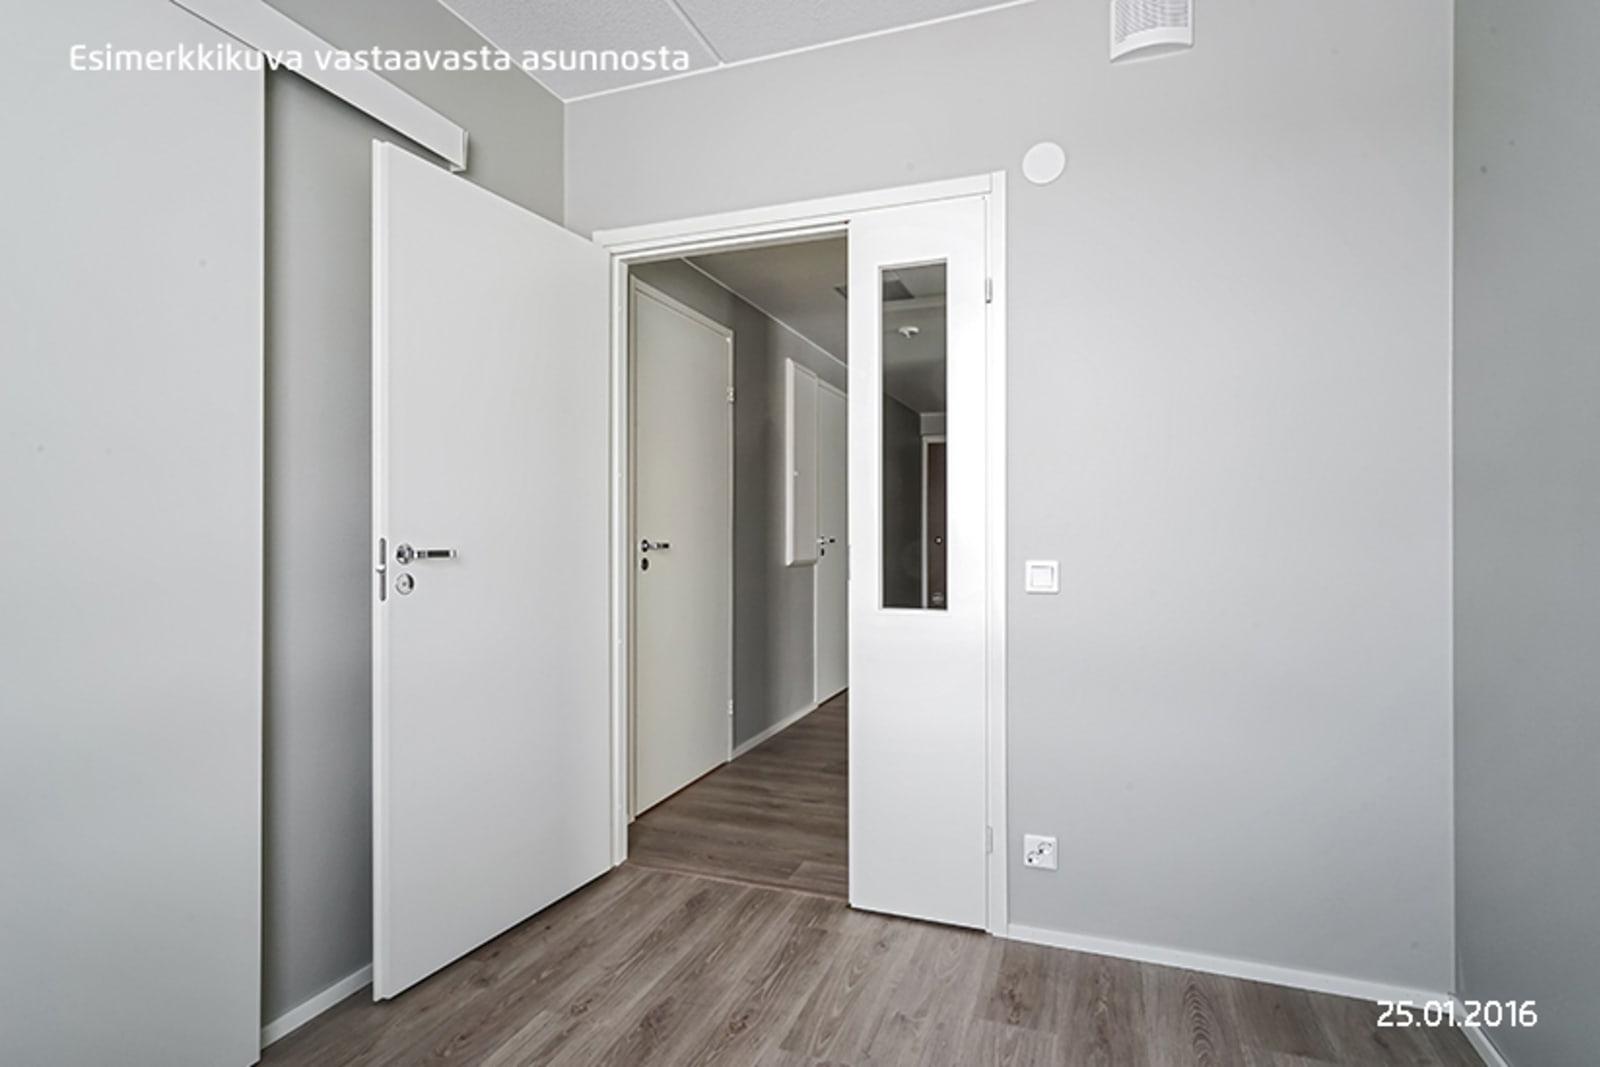 Espoo, Saunalahti, Magneettikatu 8 A 004